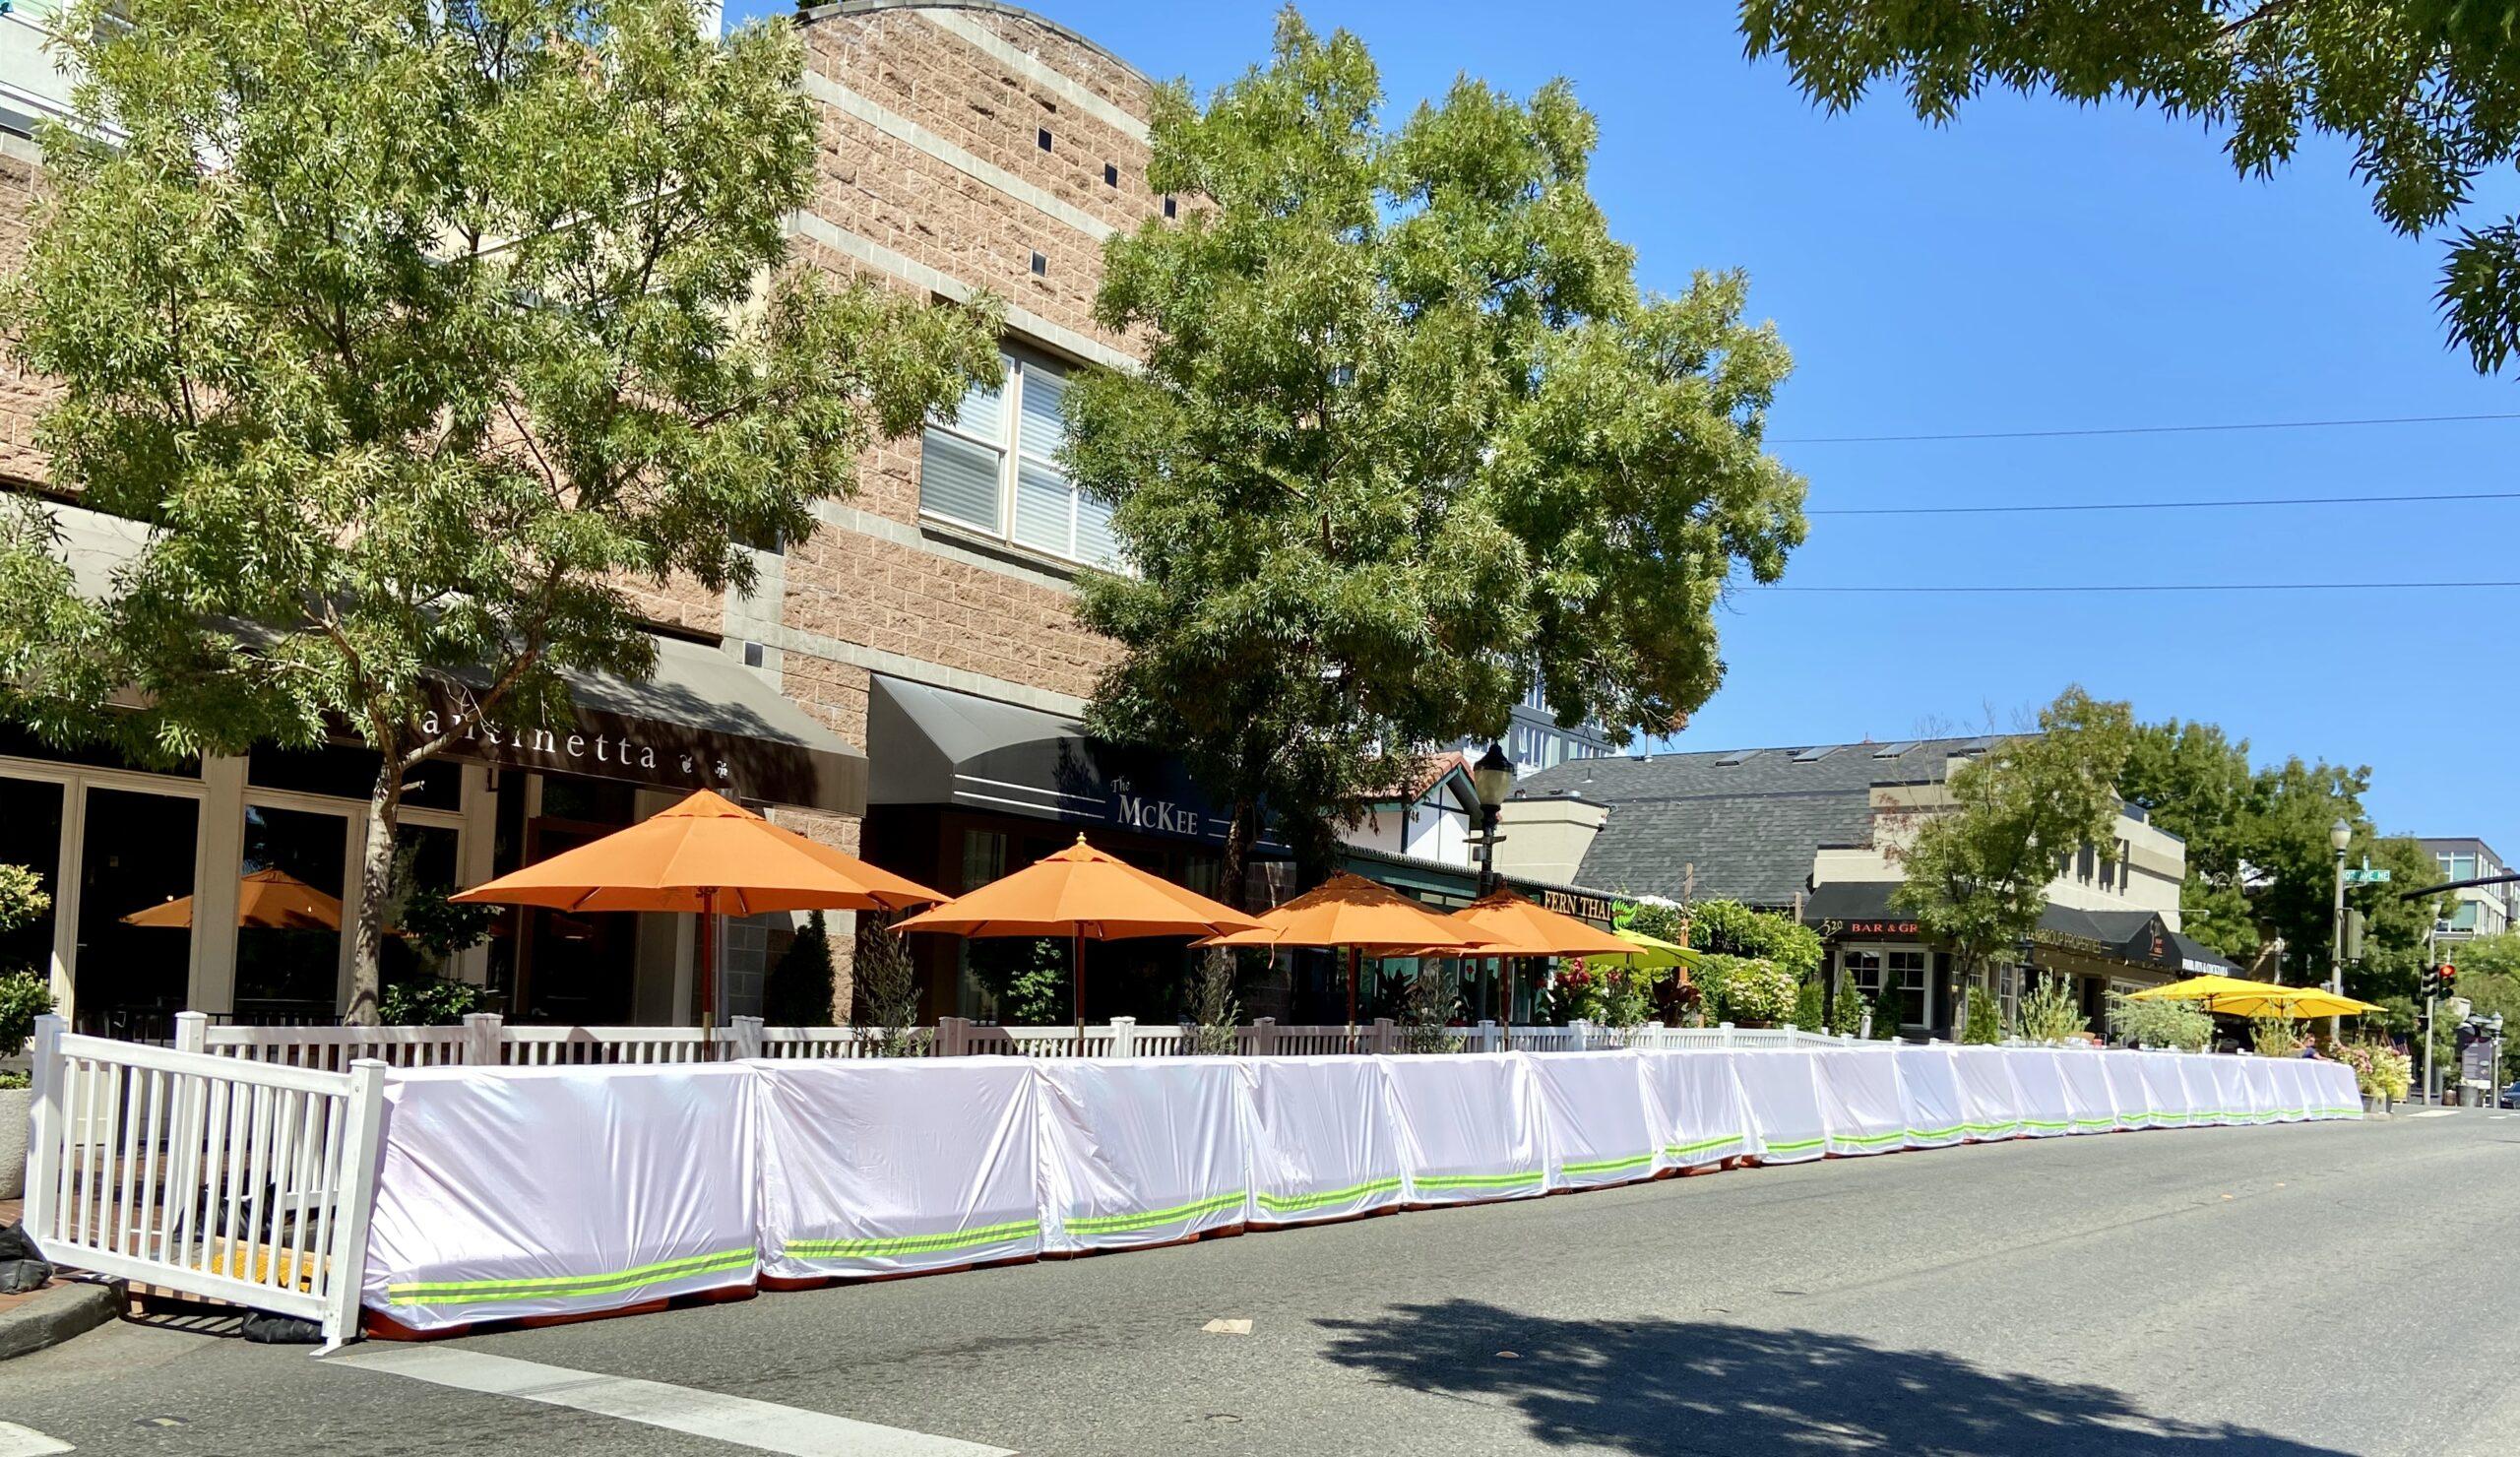 On-Street Dining Bellevue, Main Street